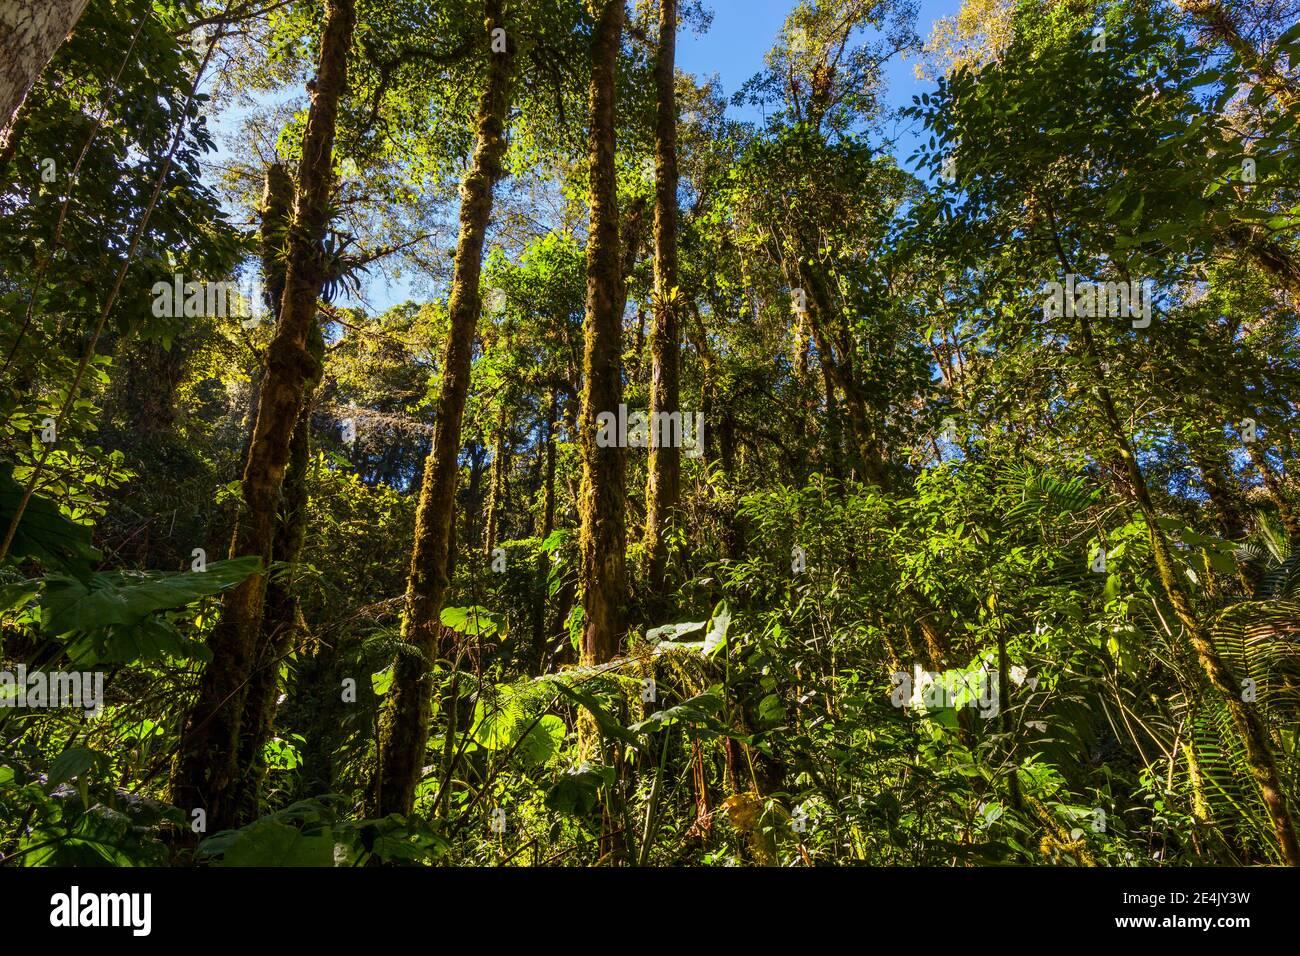 Üppiger Nebelwald im Nationalpark La Amistad, Provinz Chiriqui, Republik Panama. Stockfoto